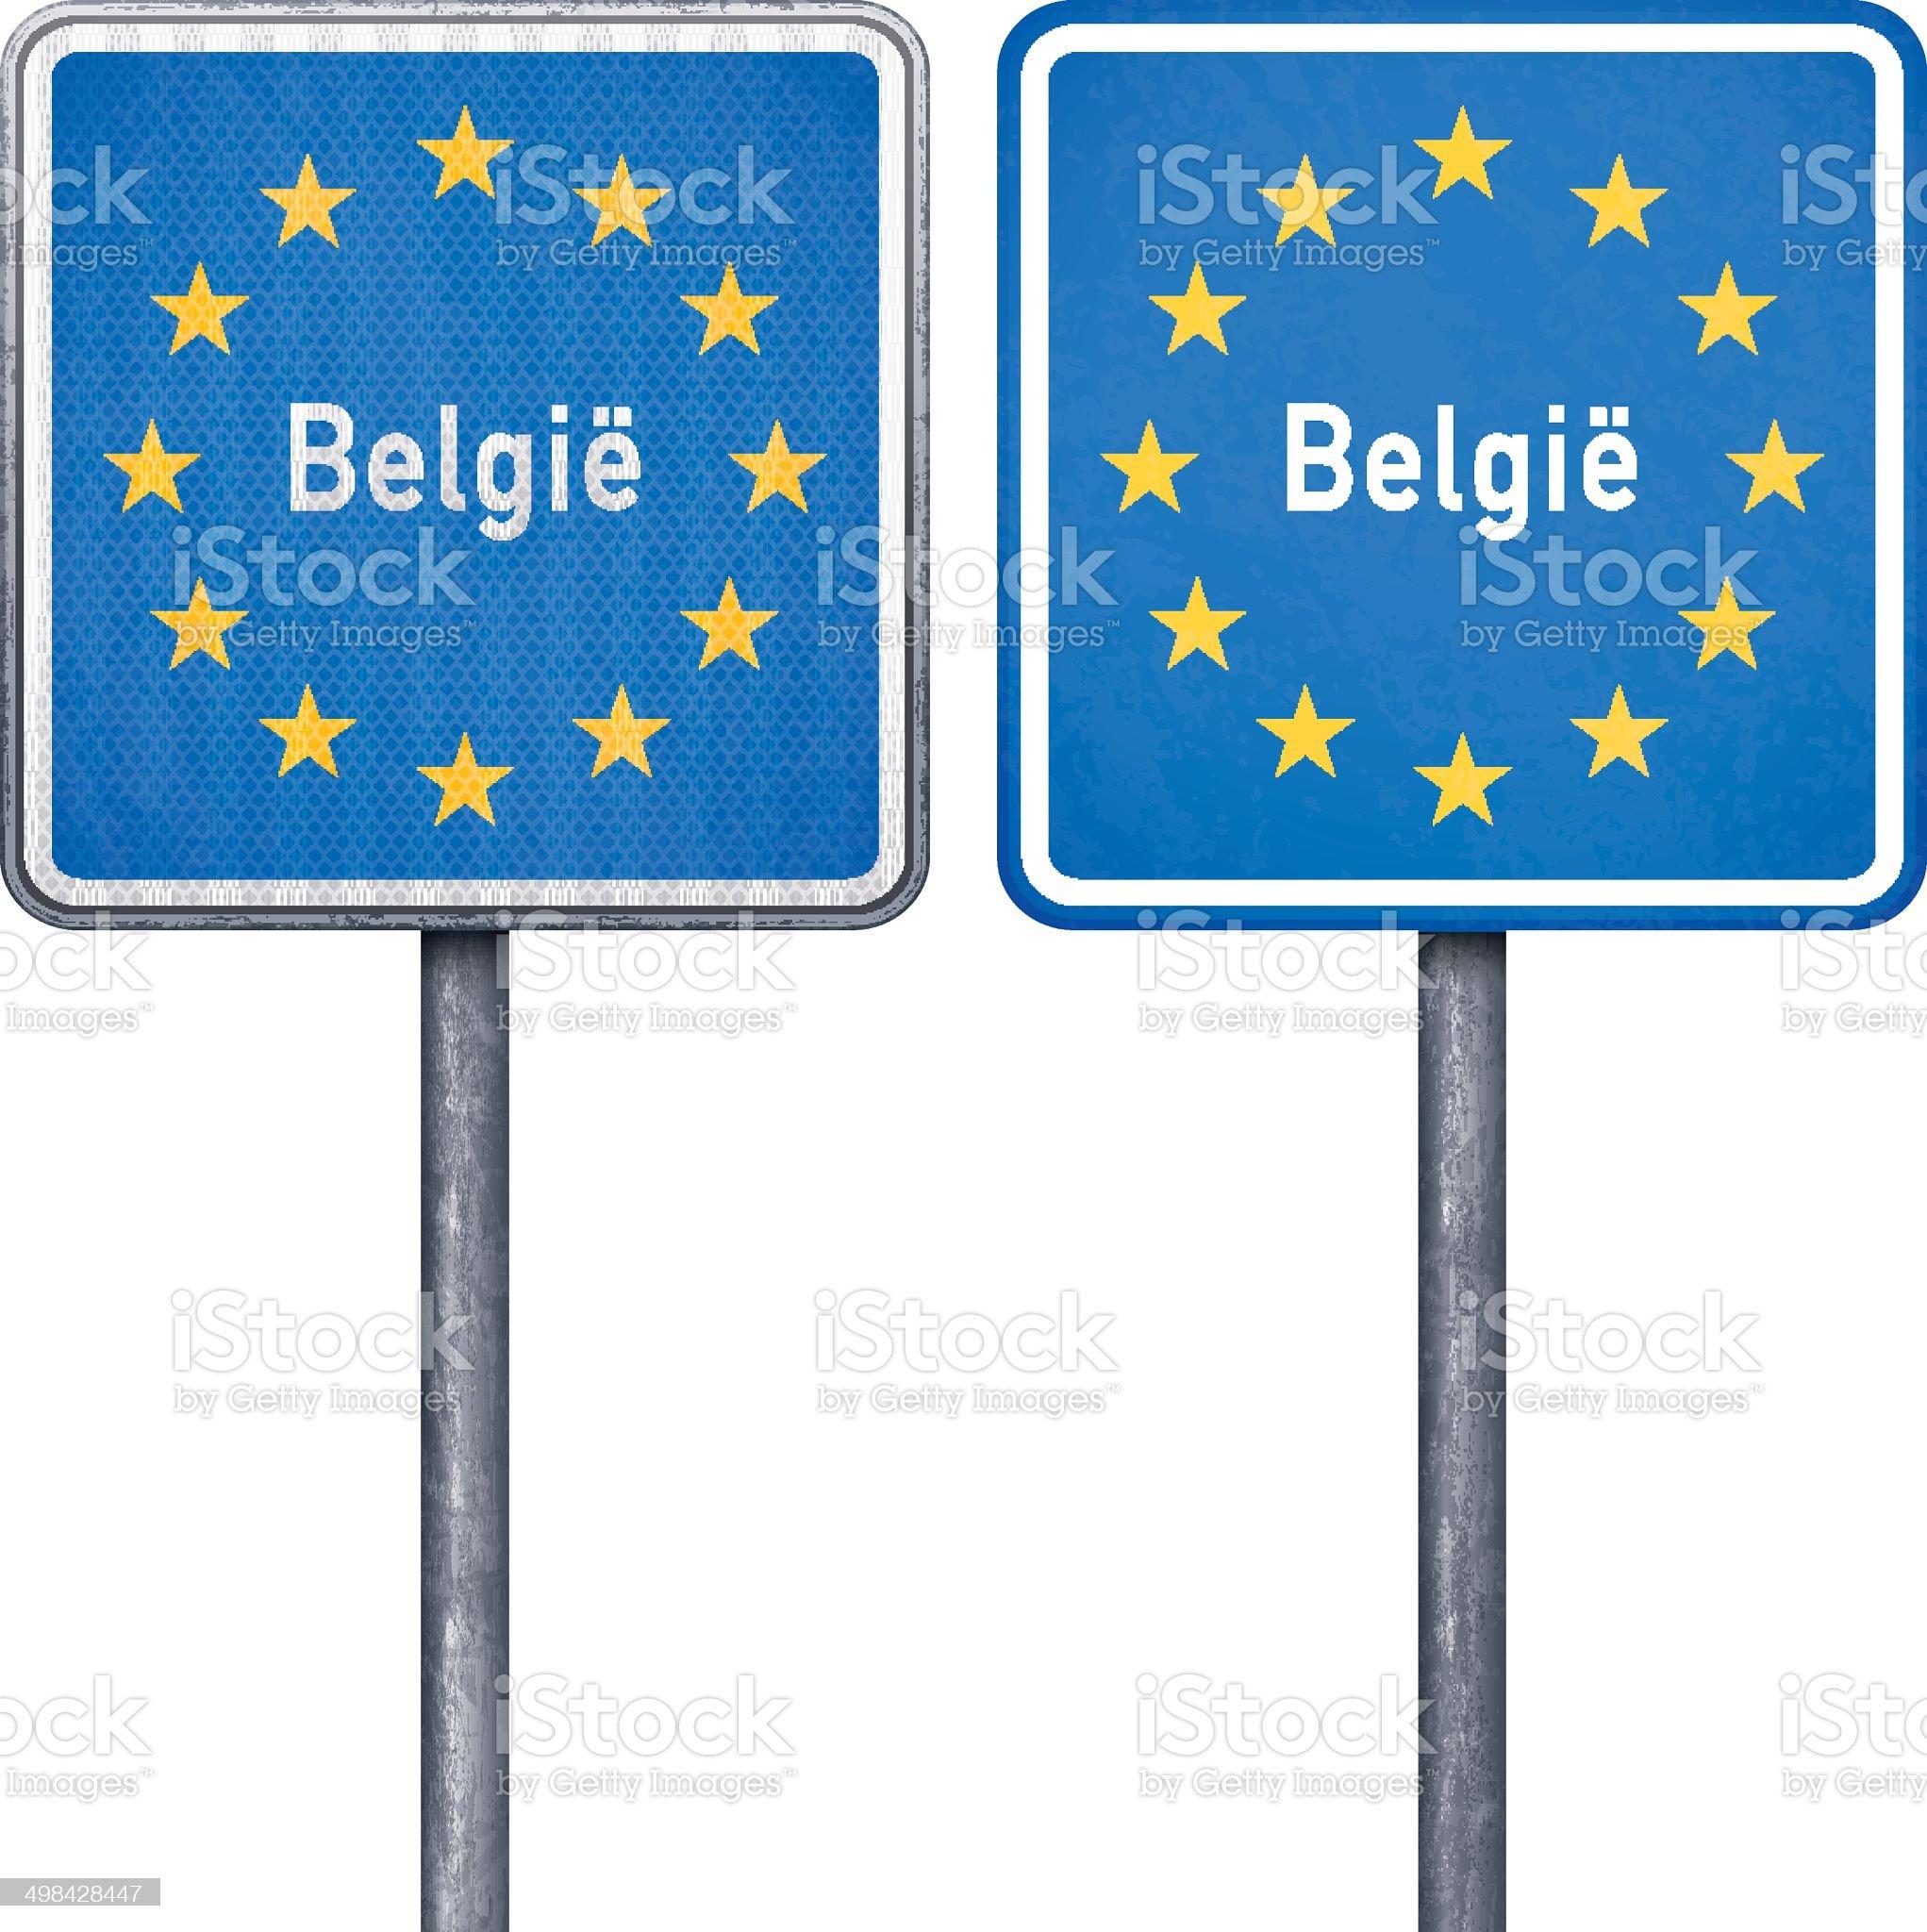 Belgian border road sign with European flag royalty-free stock vector art